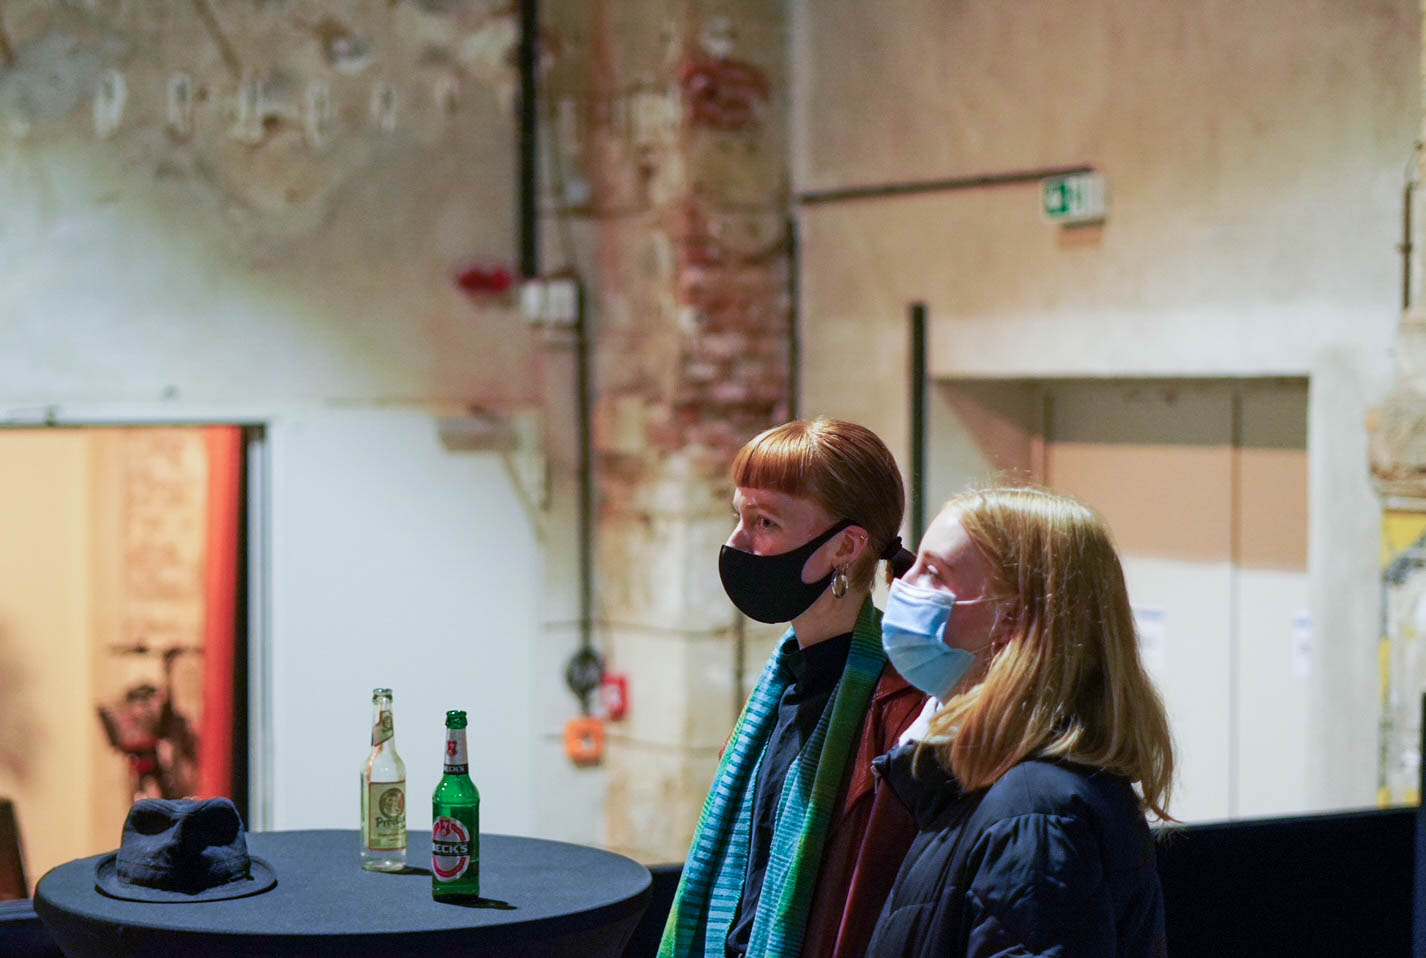 Solo-Show-vernissage-PK-at-Kunstkraftwerk-Leipzig-Germany-2020-photo-by-Tom-Gallmann-4